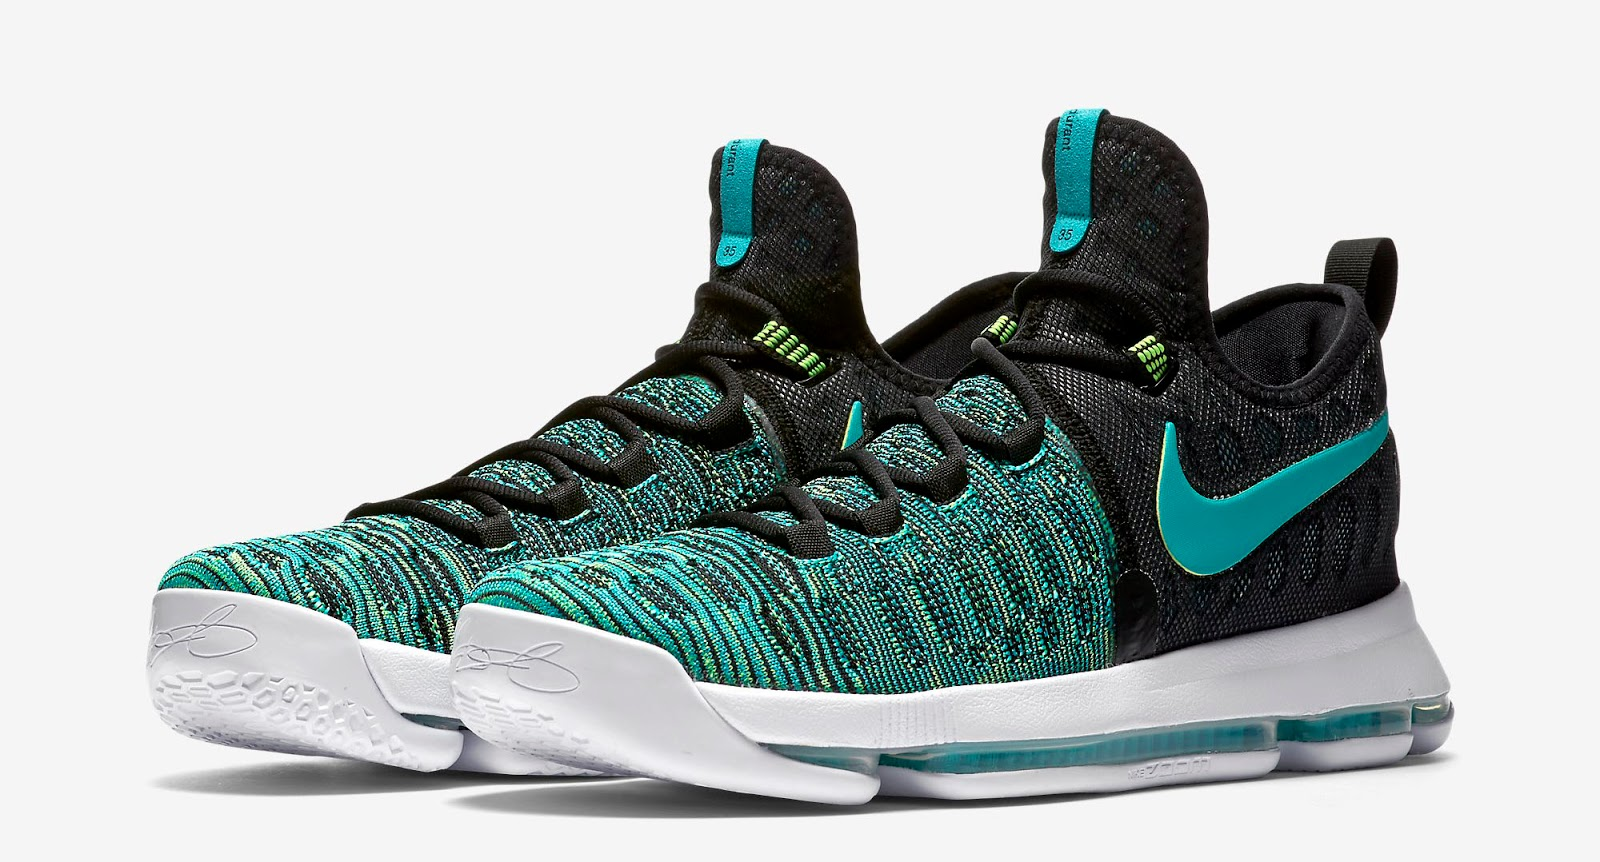 premium selection 0c252 8926e Nike Zoom KD 9